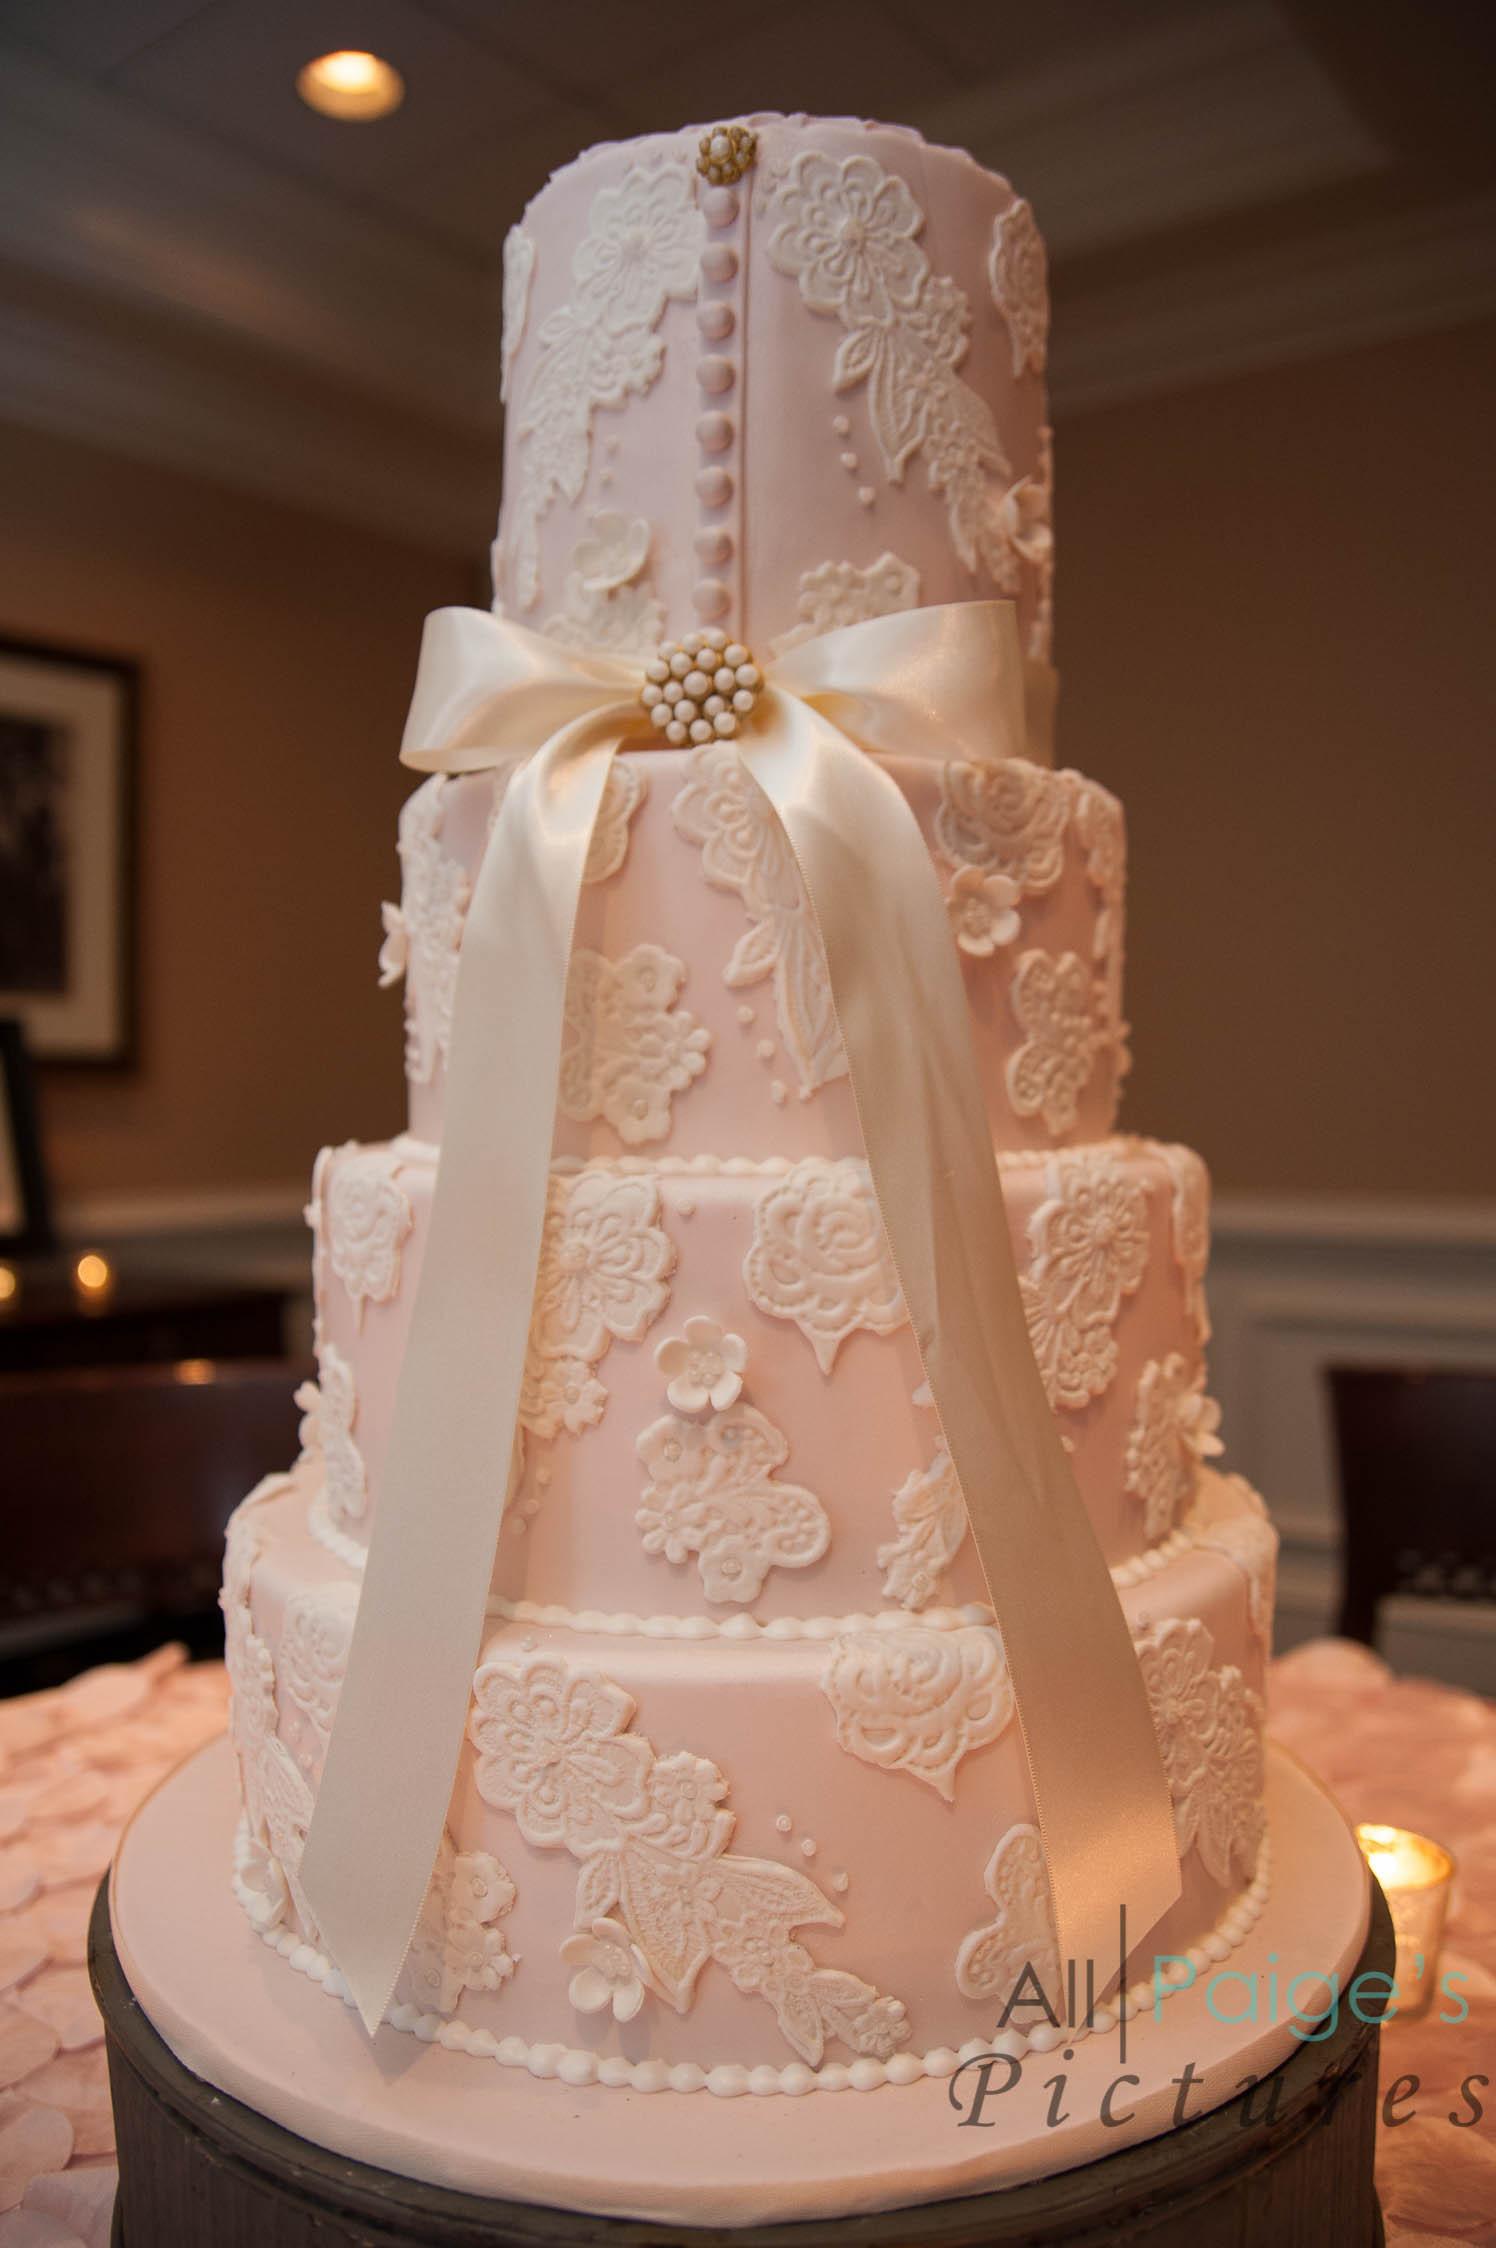 Wedding Cakes Atlanta Ga  Atlanta Wedding Cake Trends for 2015